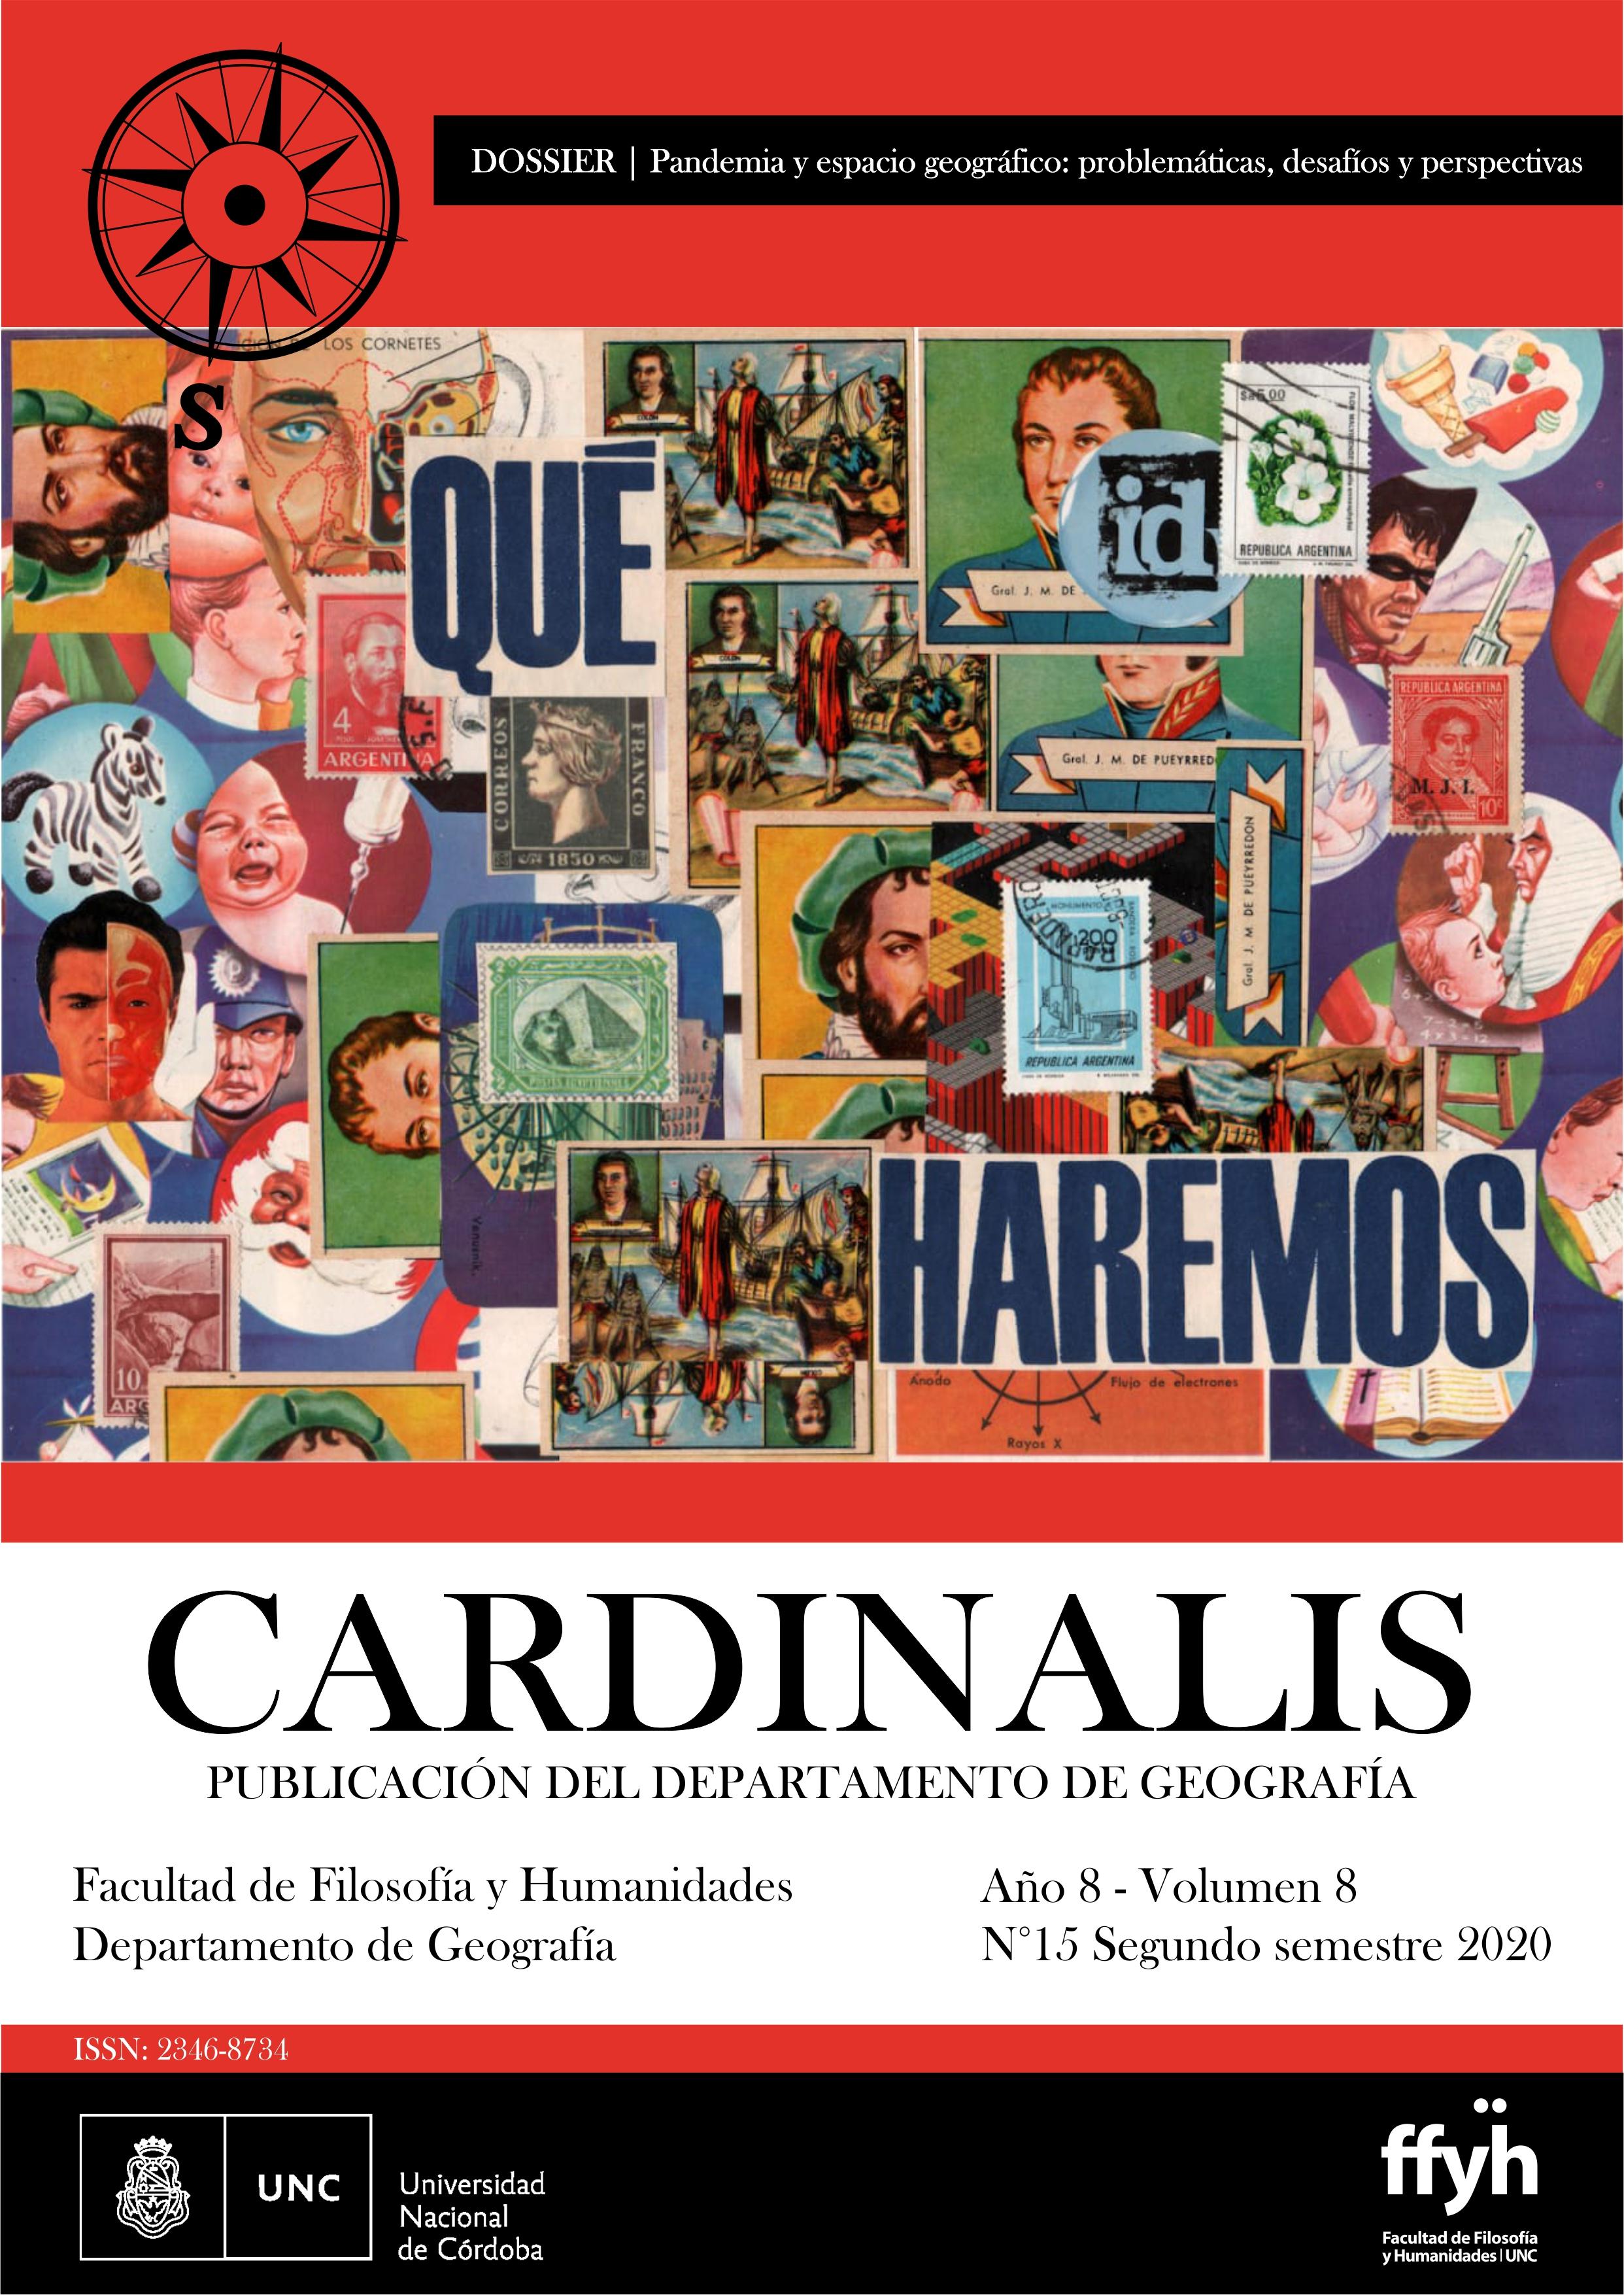 Diseño de tapa: Nadia Finck. Imagen Qué Hacemos: Vicente Girardi Callafa. Técnica: collage manual-digital (2020)